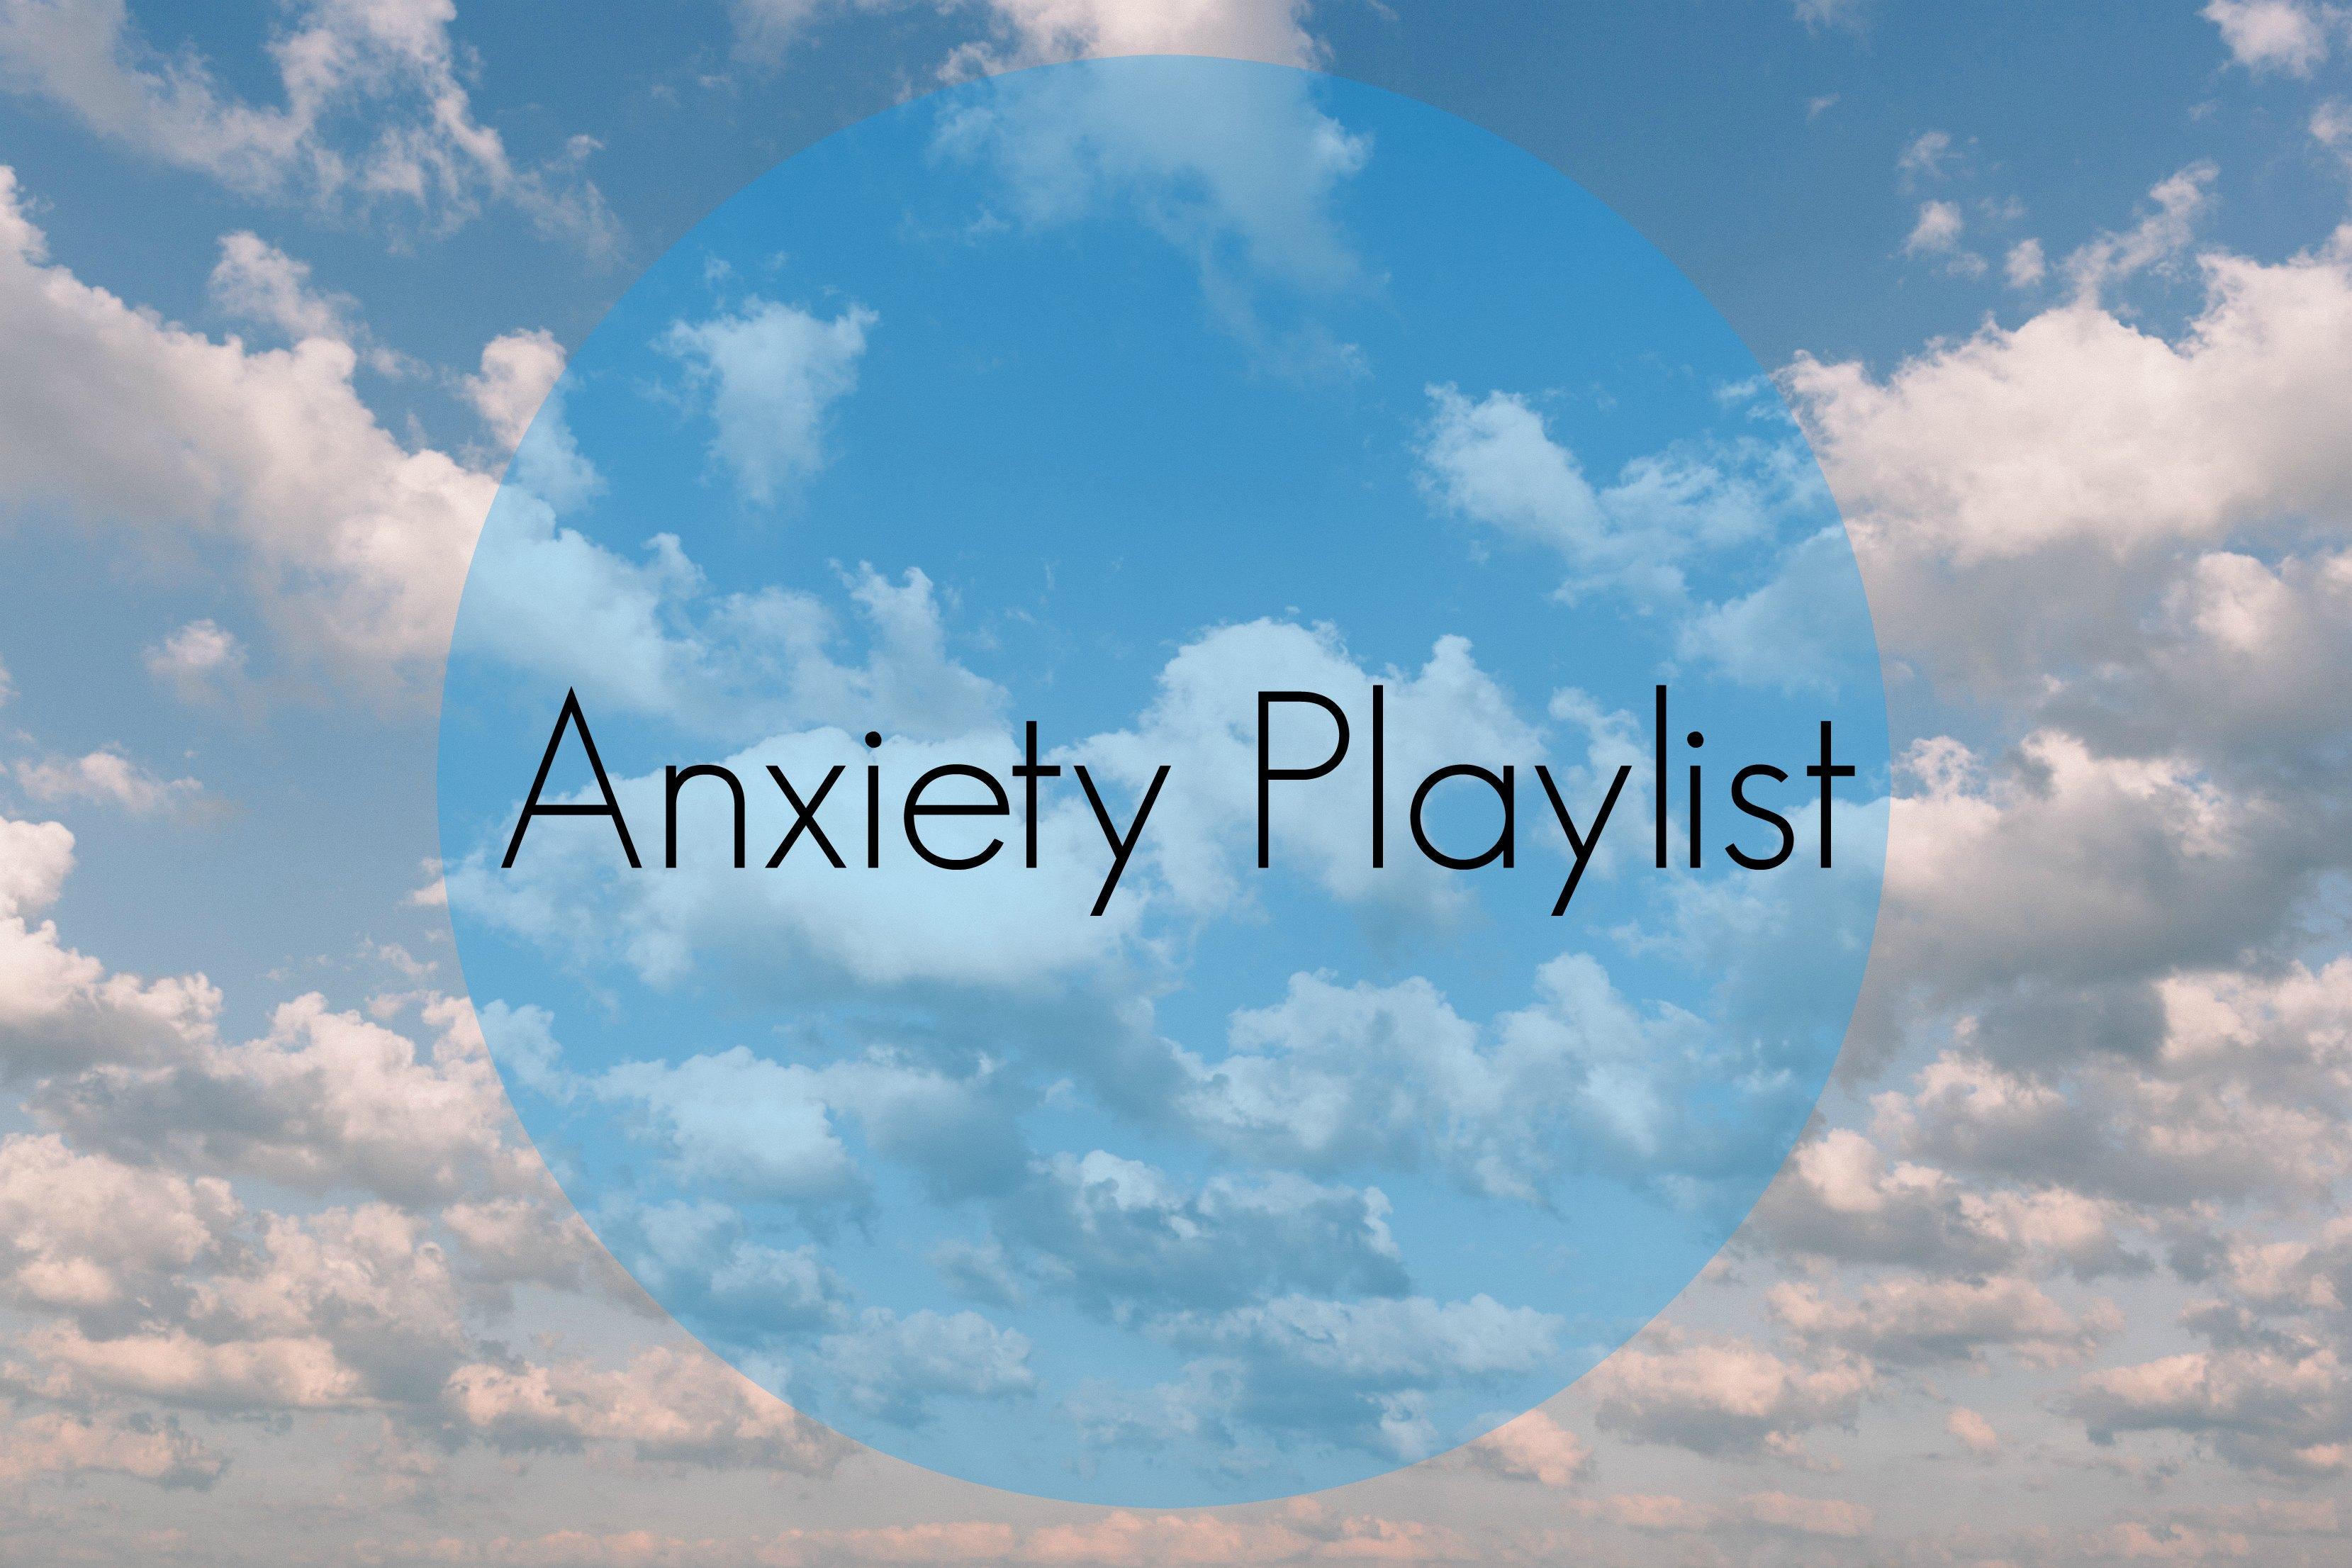 Anxiety Playlist